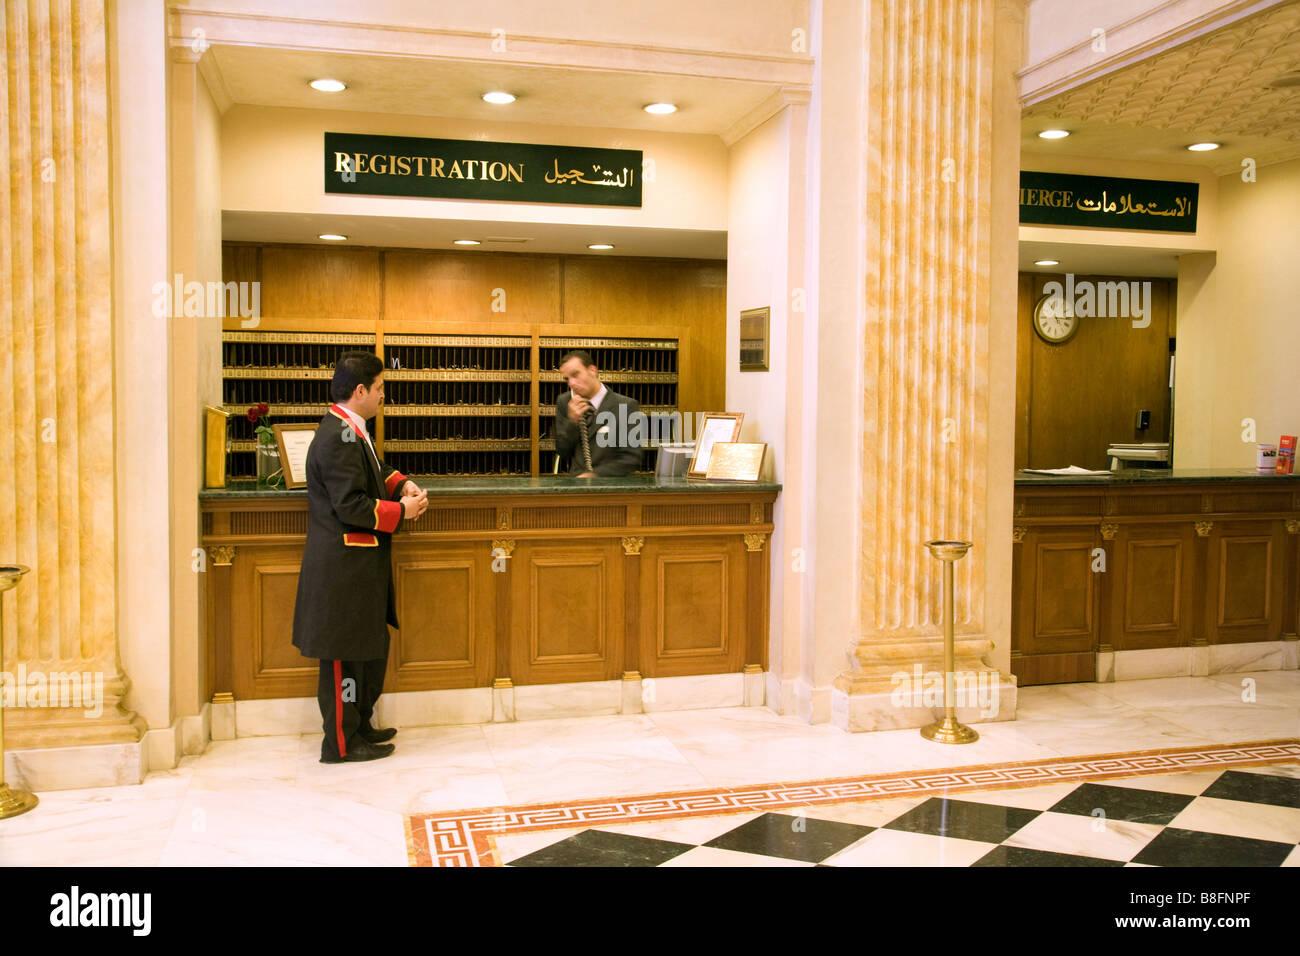 Porters At The Hotel Reception Desk, The Regency Palace Hotel, Amman,  Jordan,